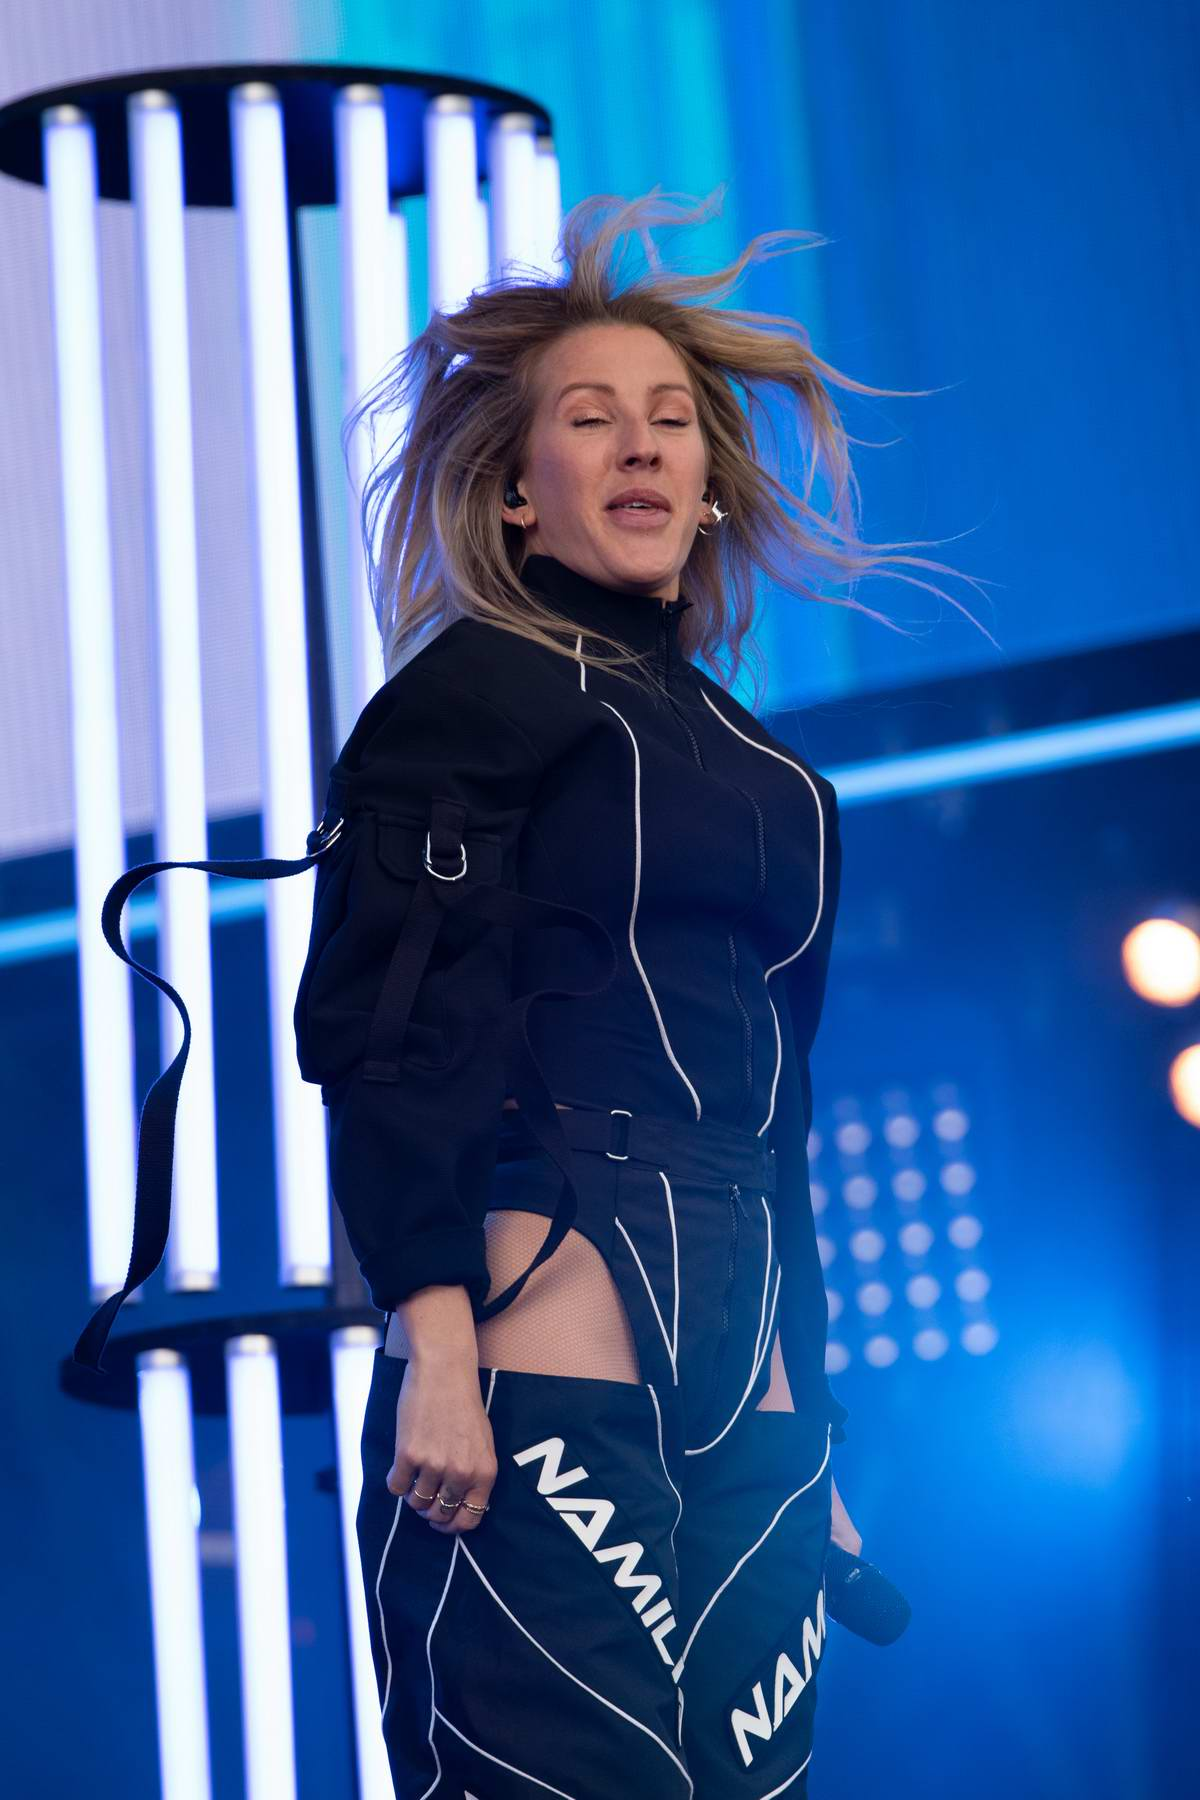 Ellie Goulding performs live at BBC Radio 1 Big Weekend at Stewart Park in Middlesborough, UK